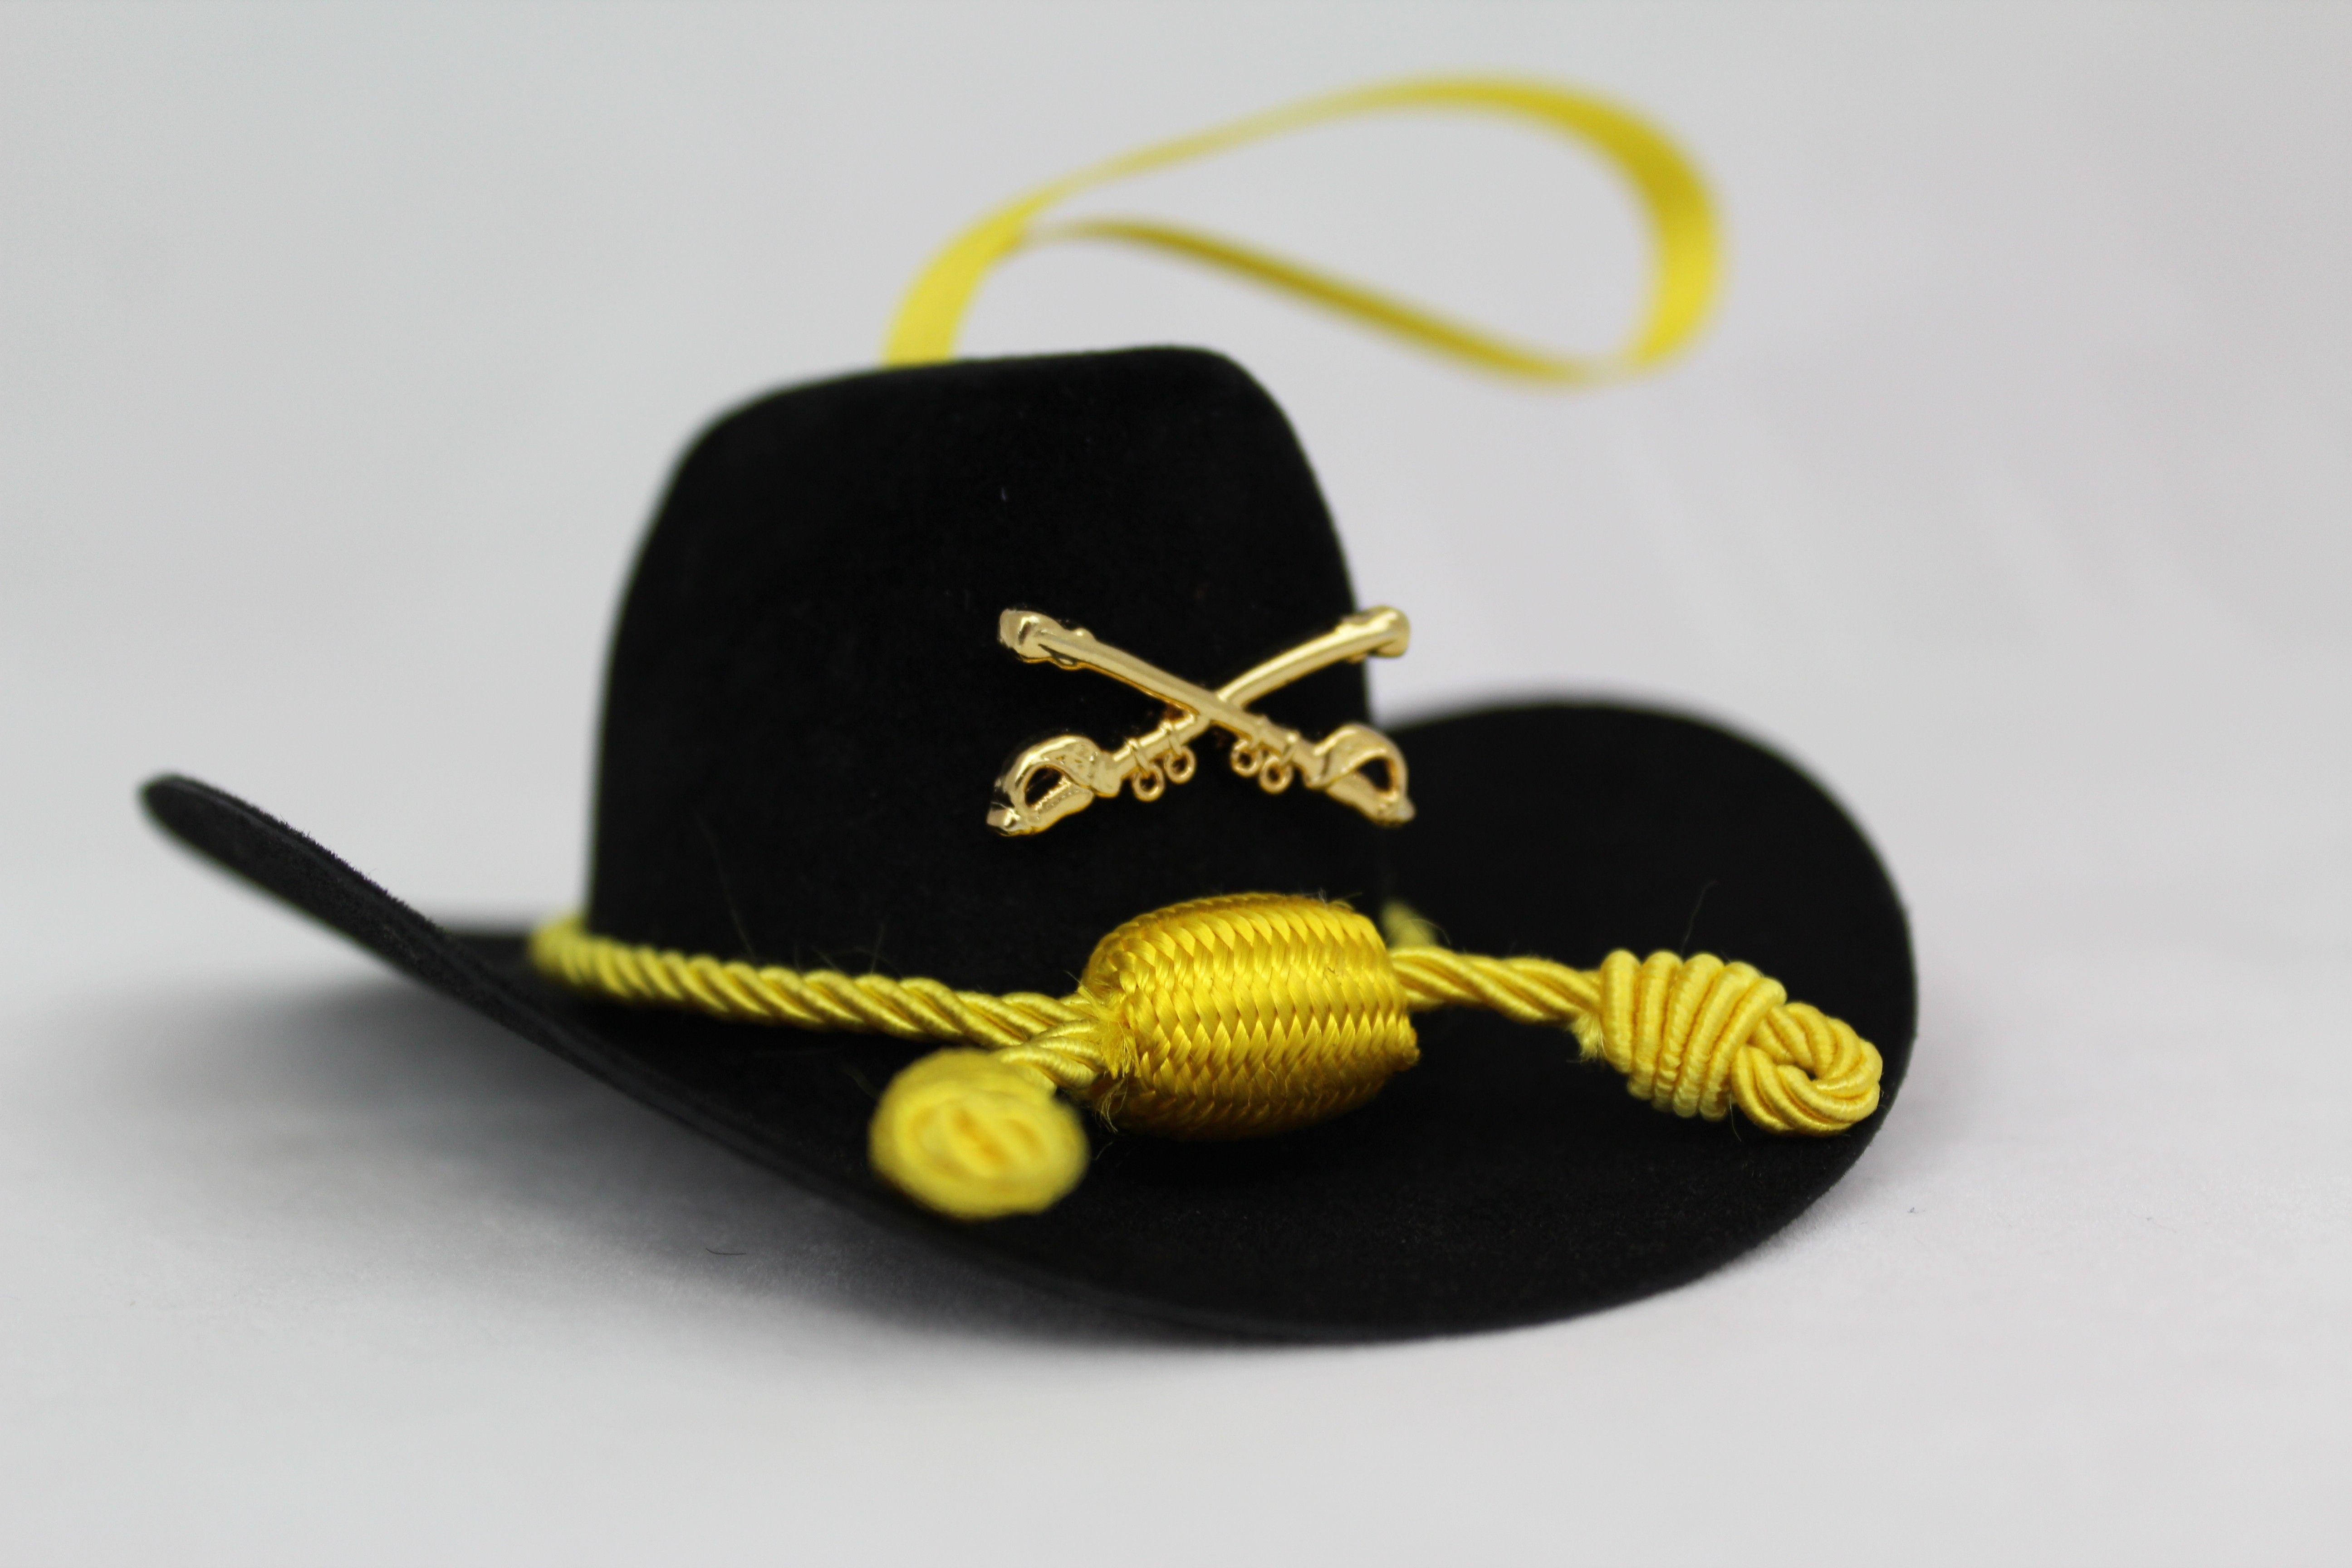 a28e66f04b93e MILITARY CHRISTMAS ORNAMENTS  Cavalry Hat ornament by CAVHOOAH  www.operationwearehere.com deploymentproducts.html